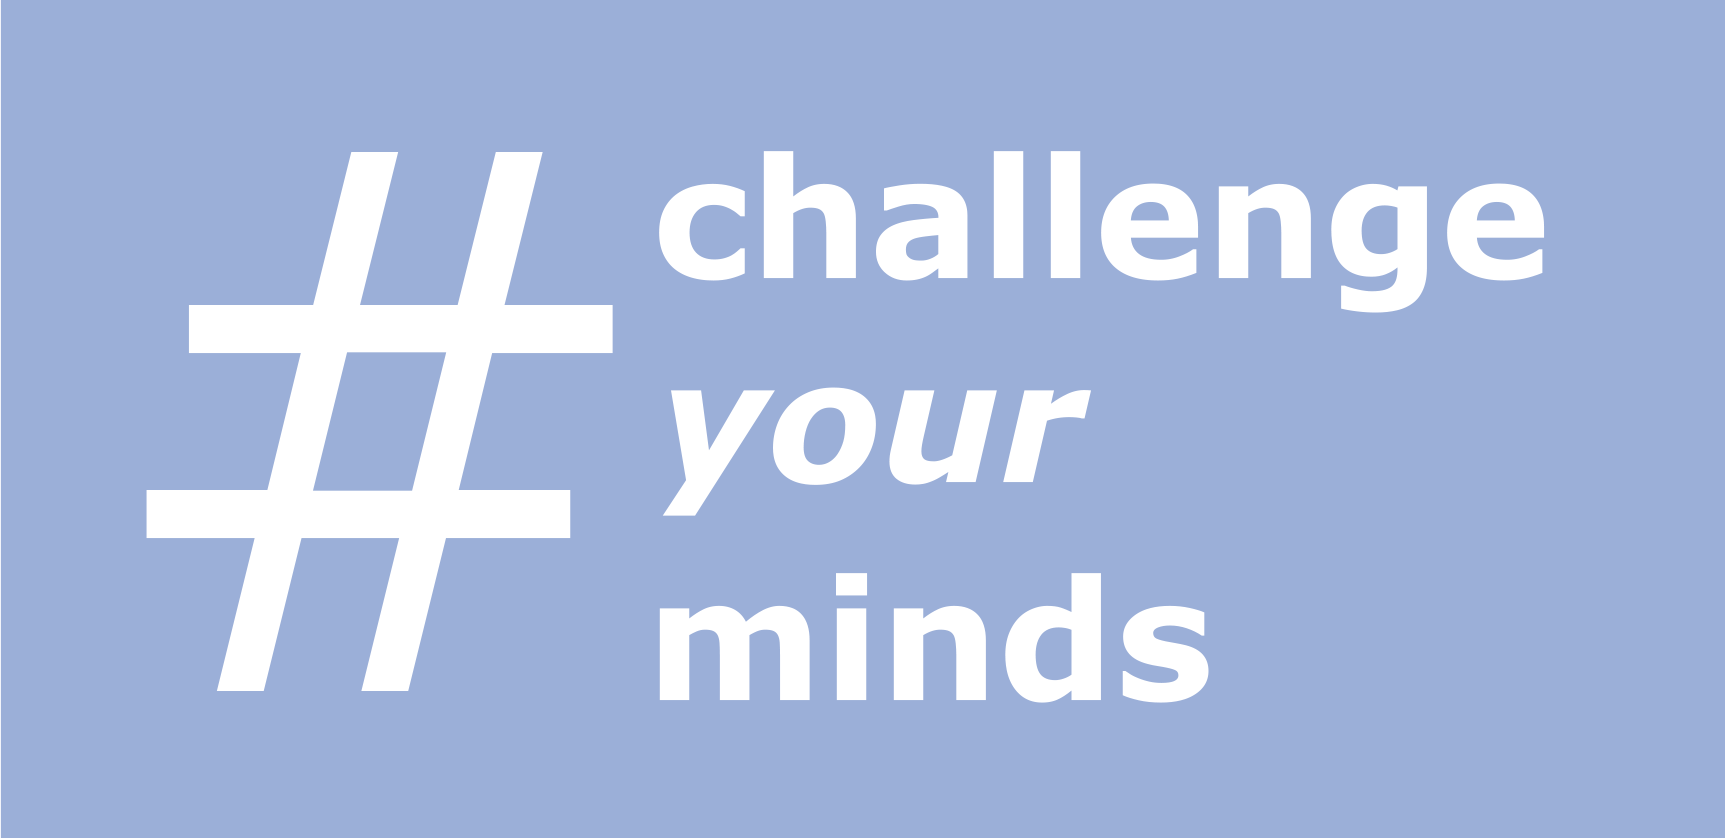 Challengeyourminds-logga